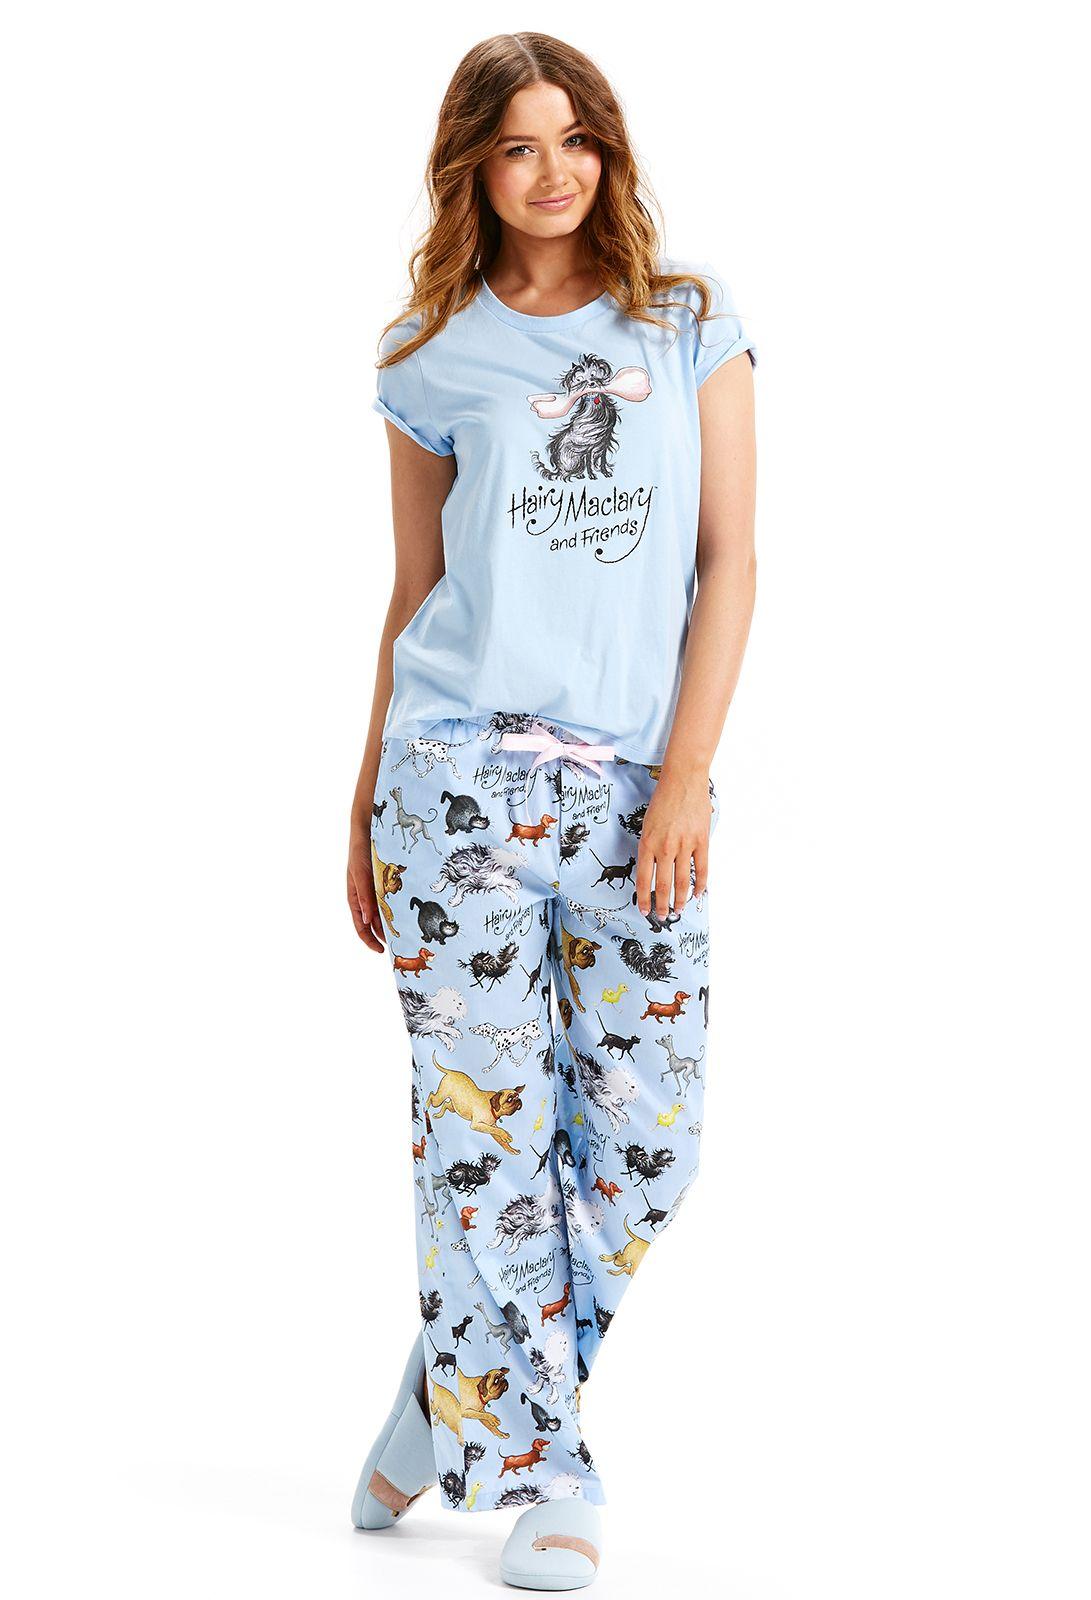 171b7022ca999 Peter Alexander Hairy Maclary Women's Classic Pant Sleepwear Set ...